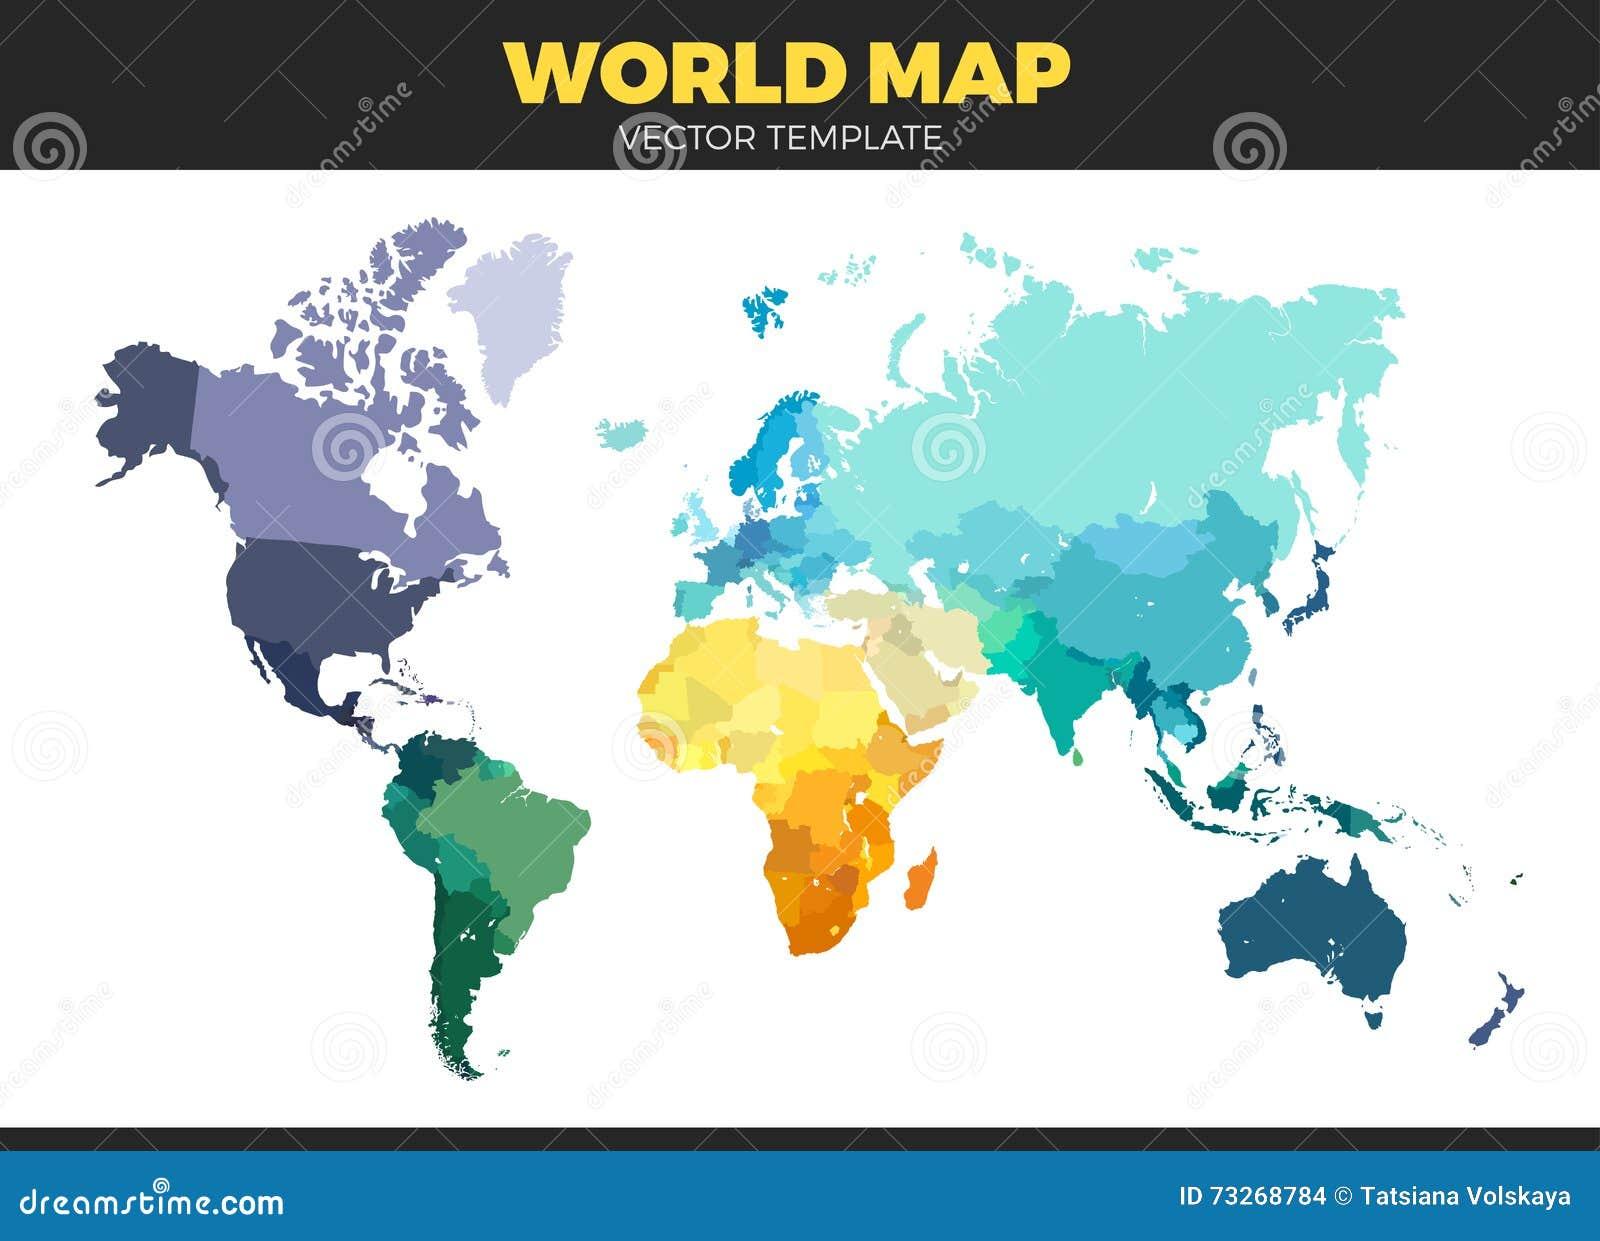 Color World Map Illustration Stock Vector Illustration Of Africa